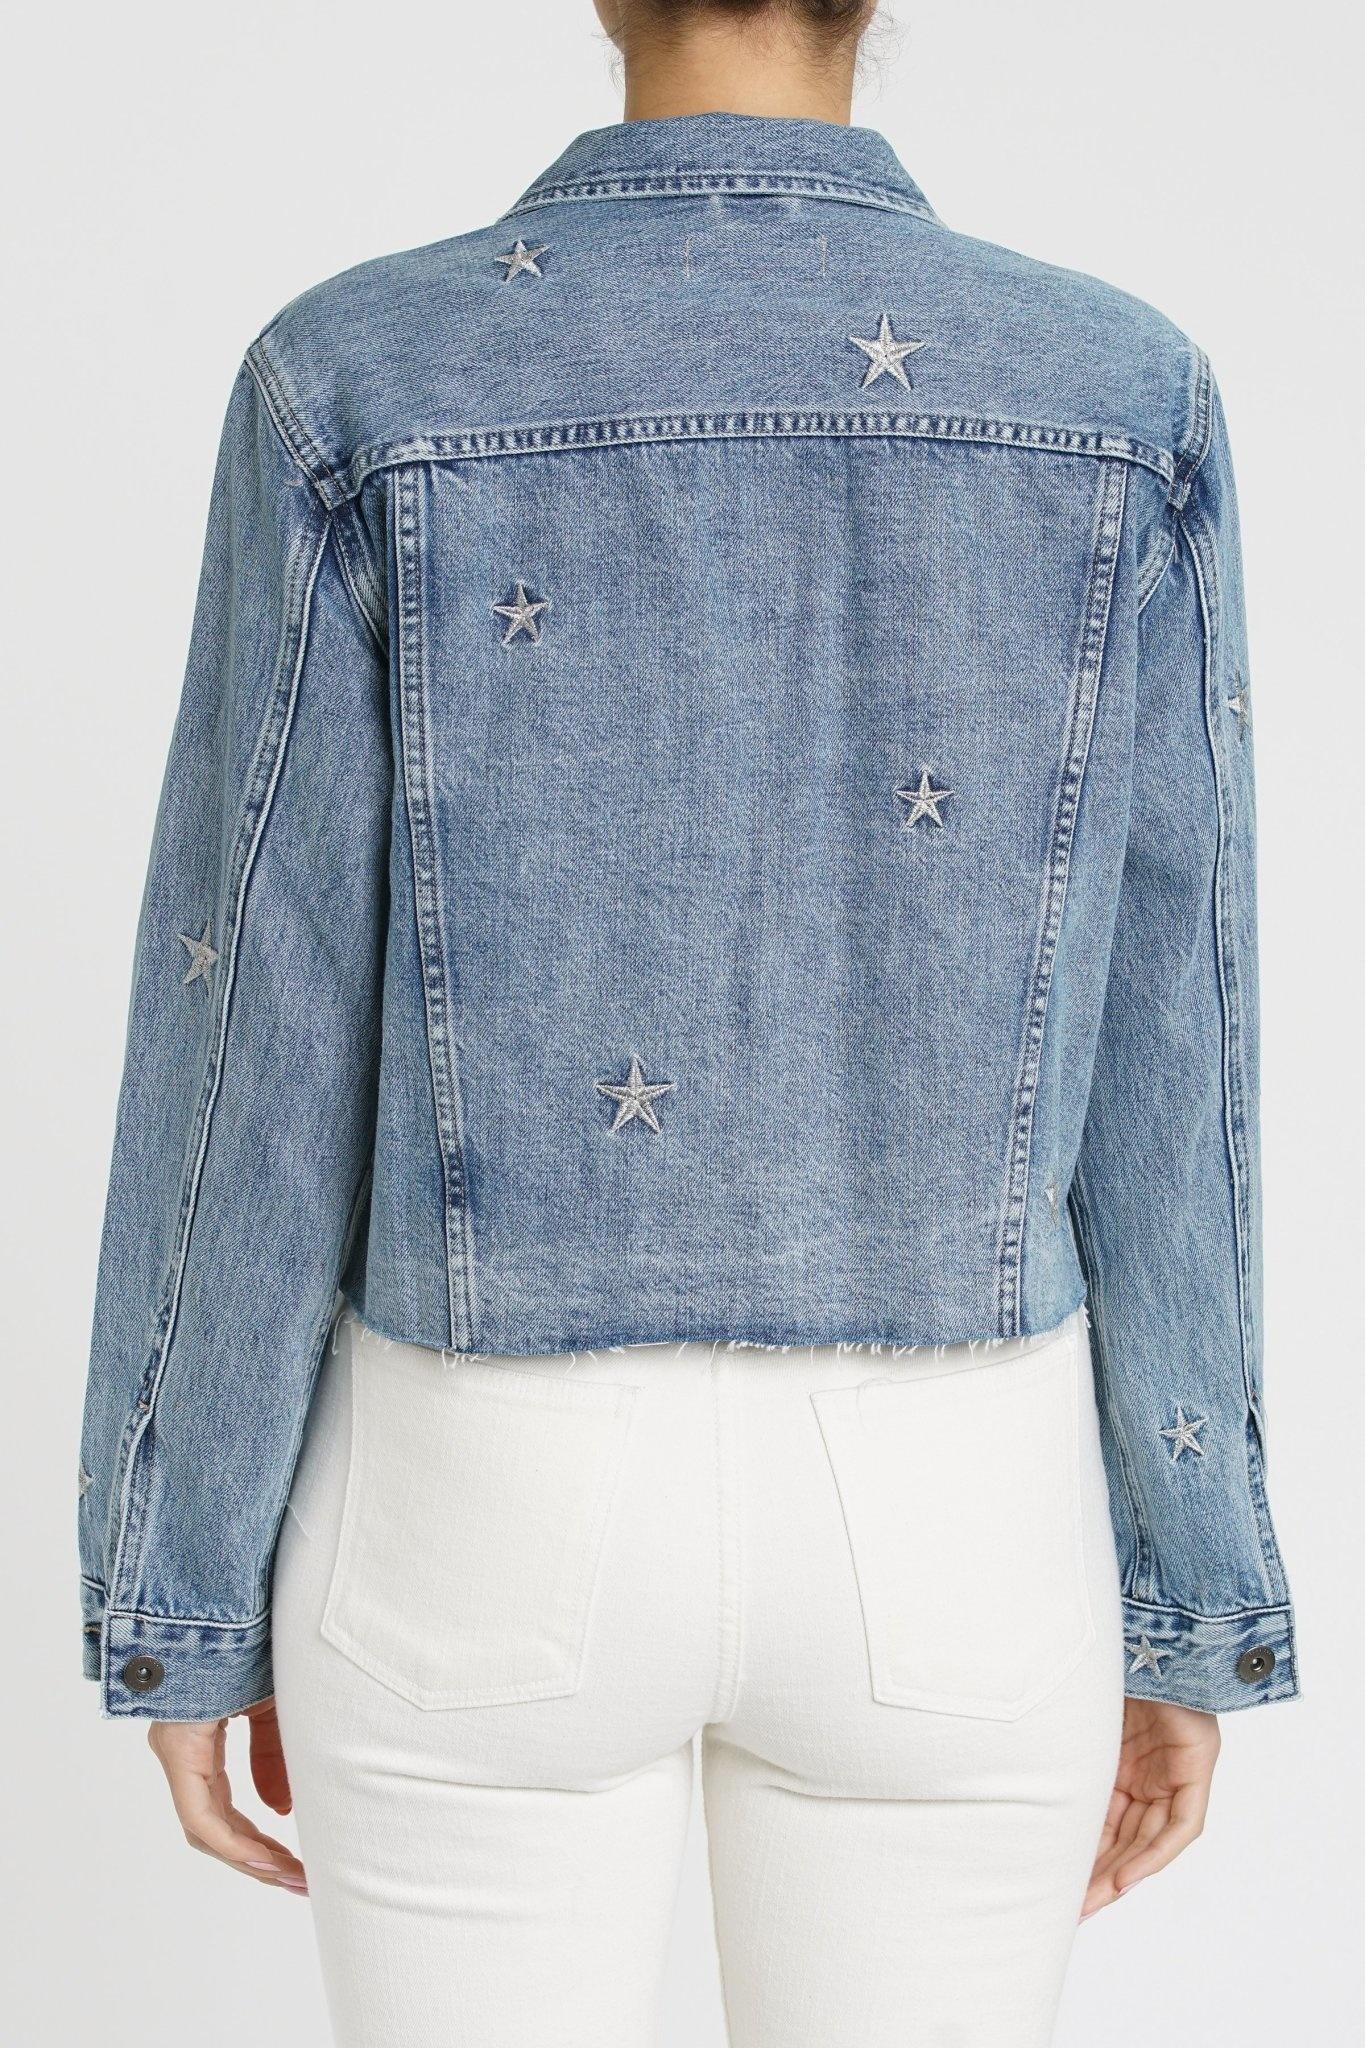 Atikshop Naya Crop Star Embroidery Denim Jacket